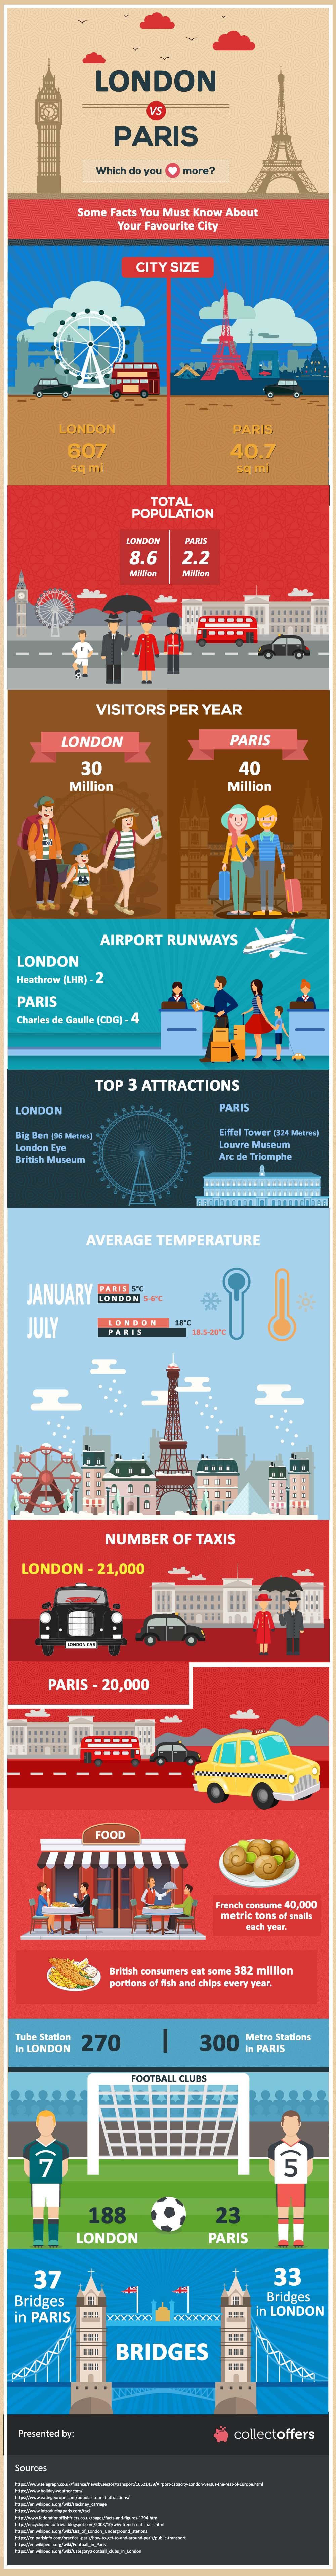 London Vs Paris: Who Do You Love More?